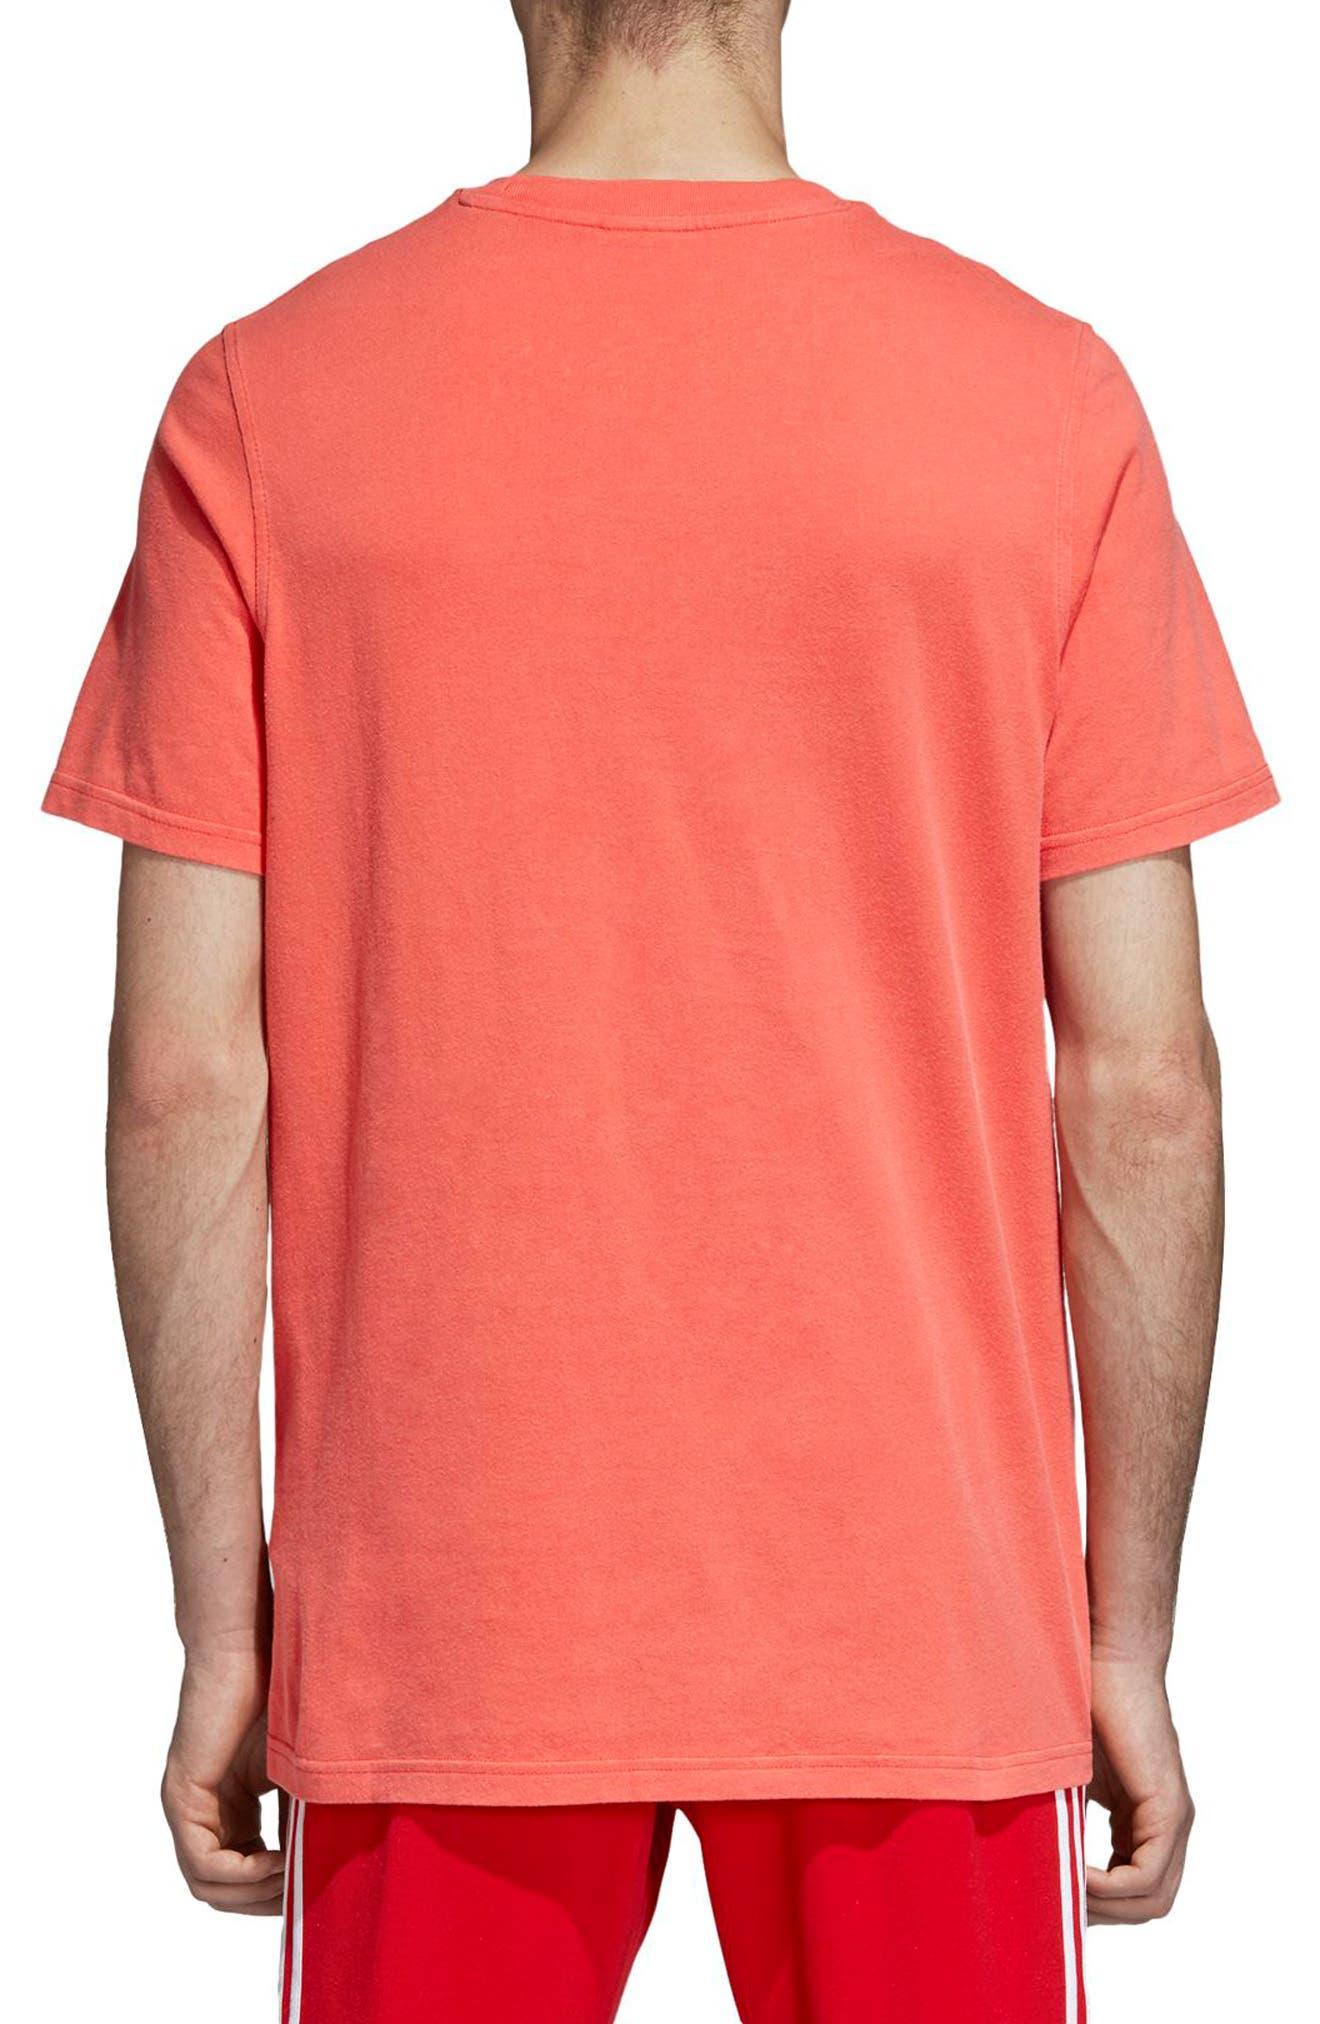 Trefoil Graphic T-Shirt,                             Alternate thumbnail 2, color,                             BRIGHT RED